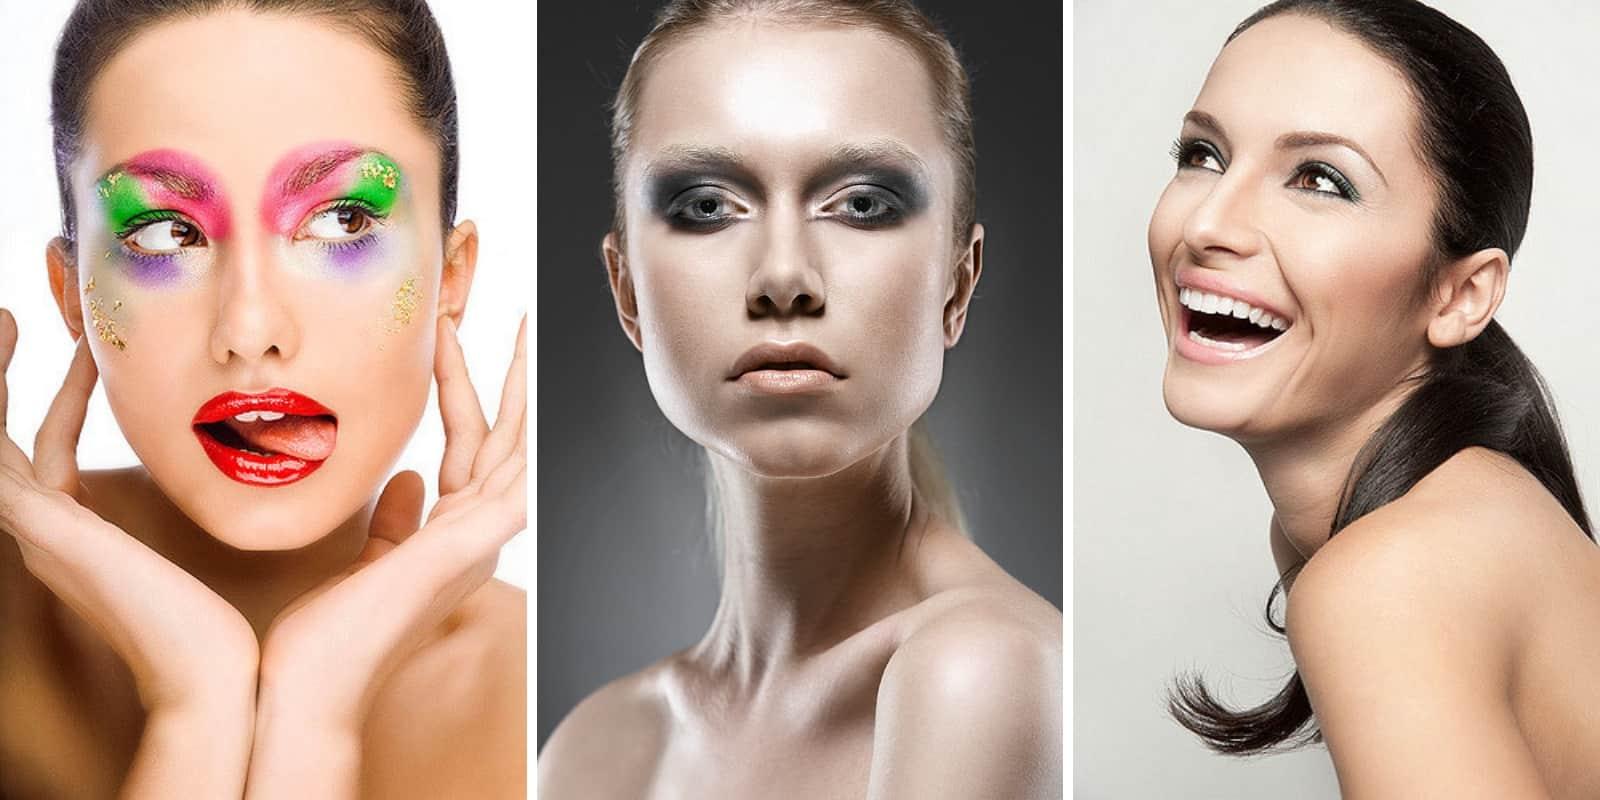 colaboración con maquilladora